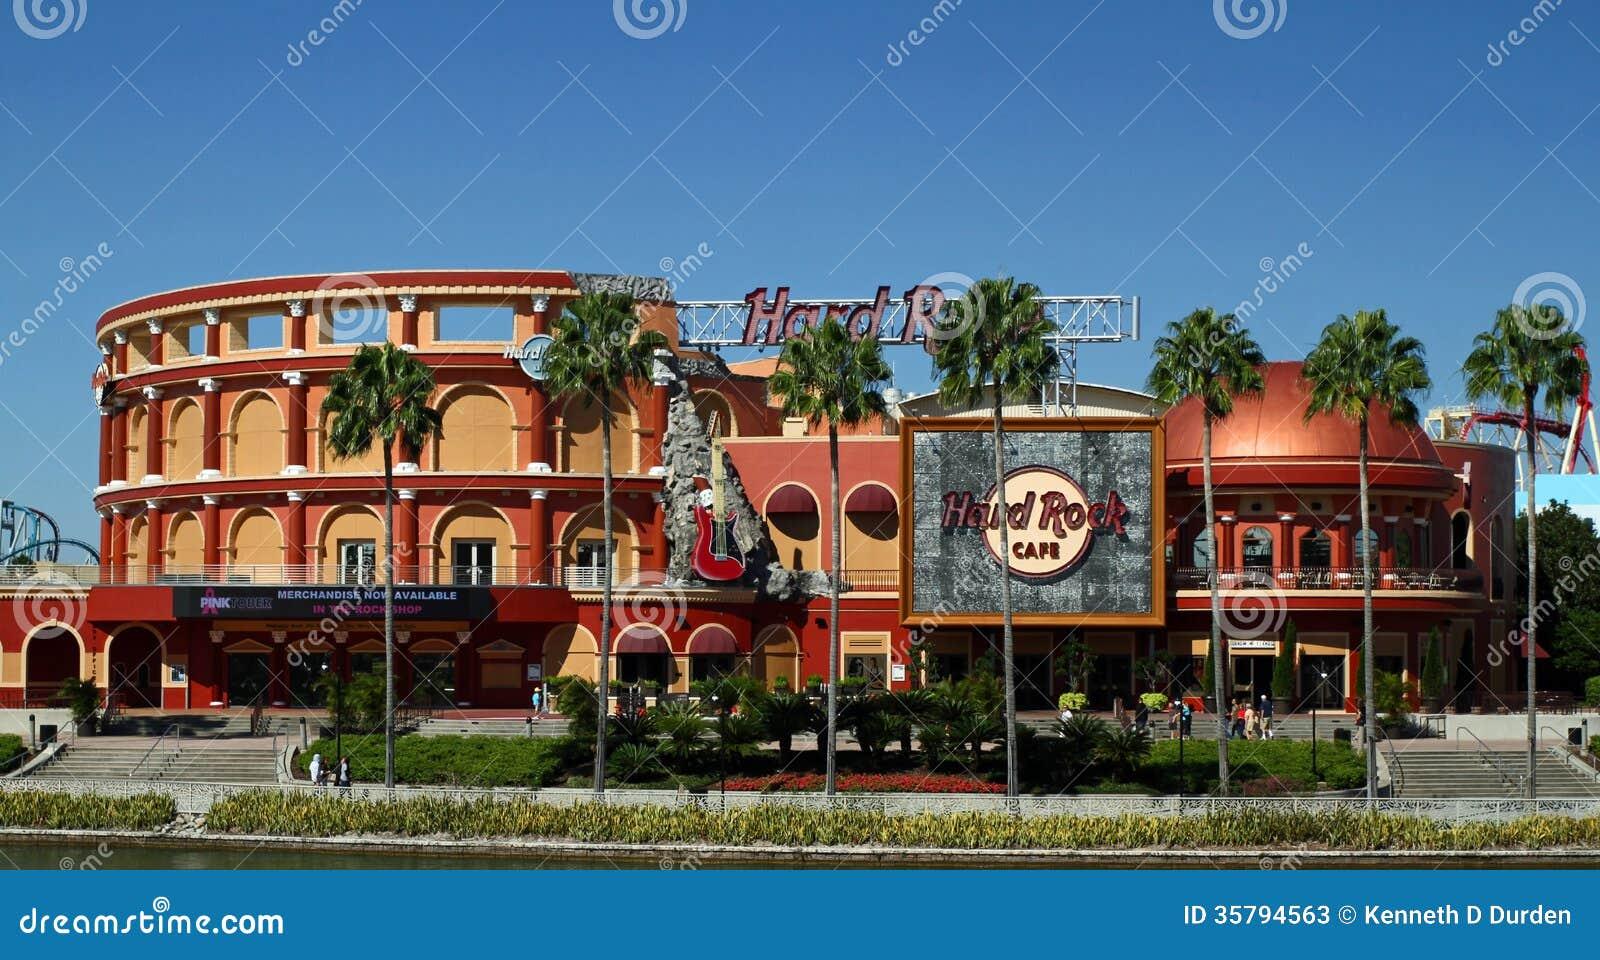 Hard Rock Cafe Universal Studios Prices